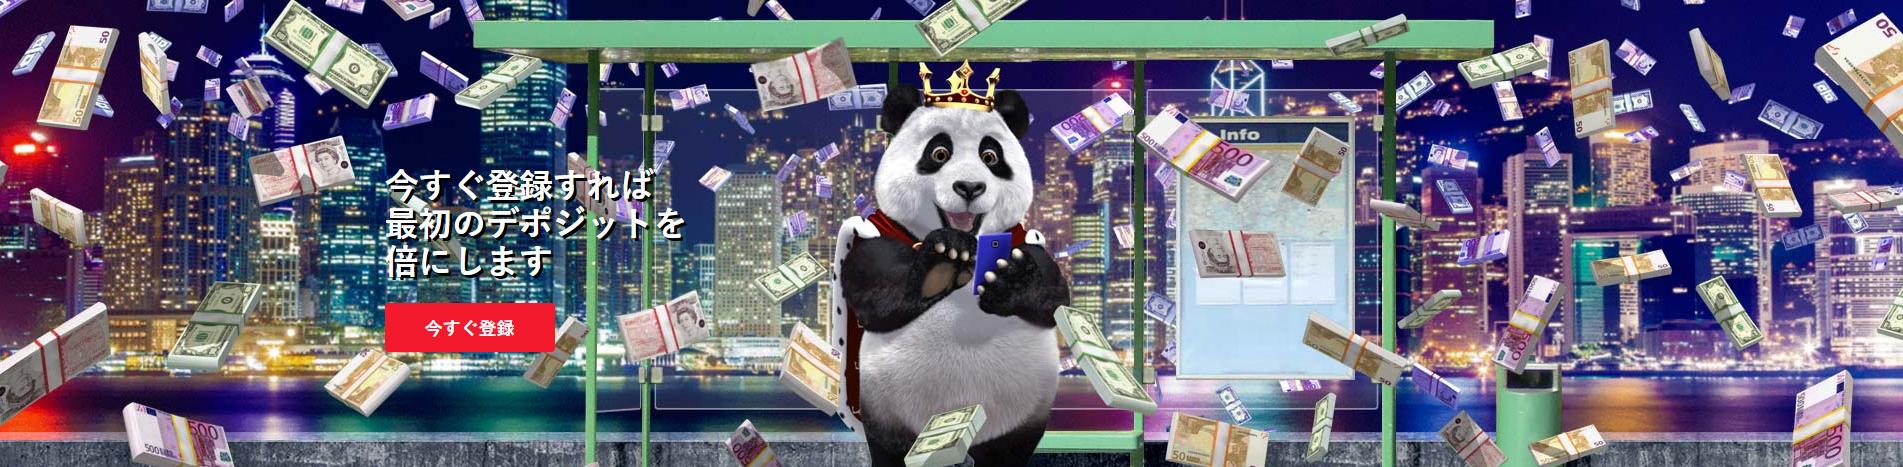 Royal Panda Casino Content Images 03 - Japan CasinoTop